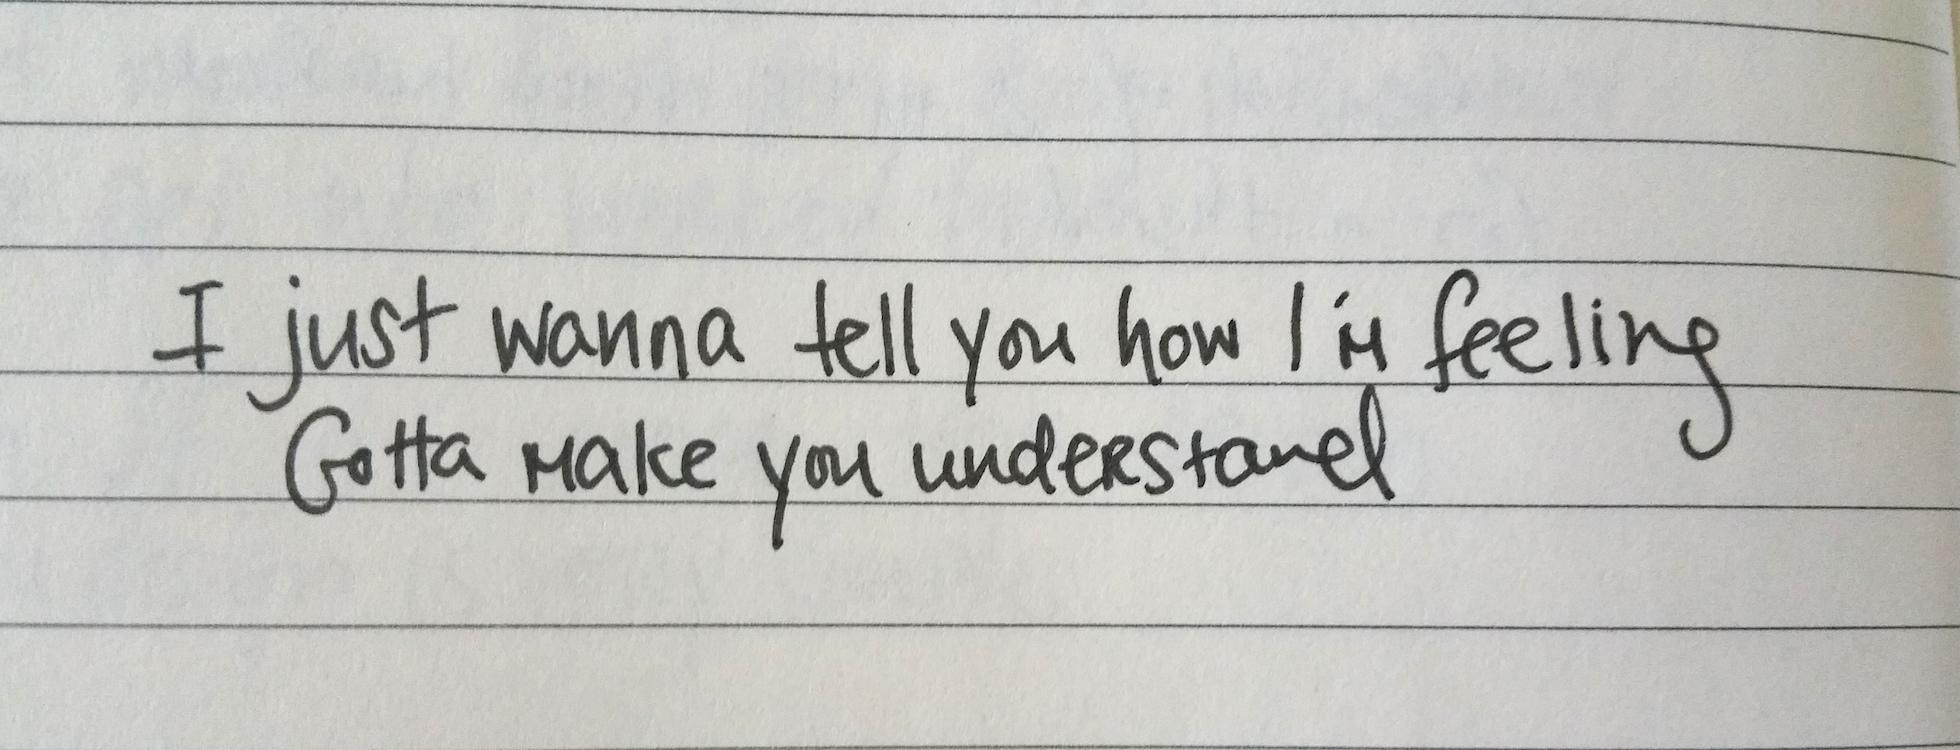 natt writes